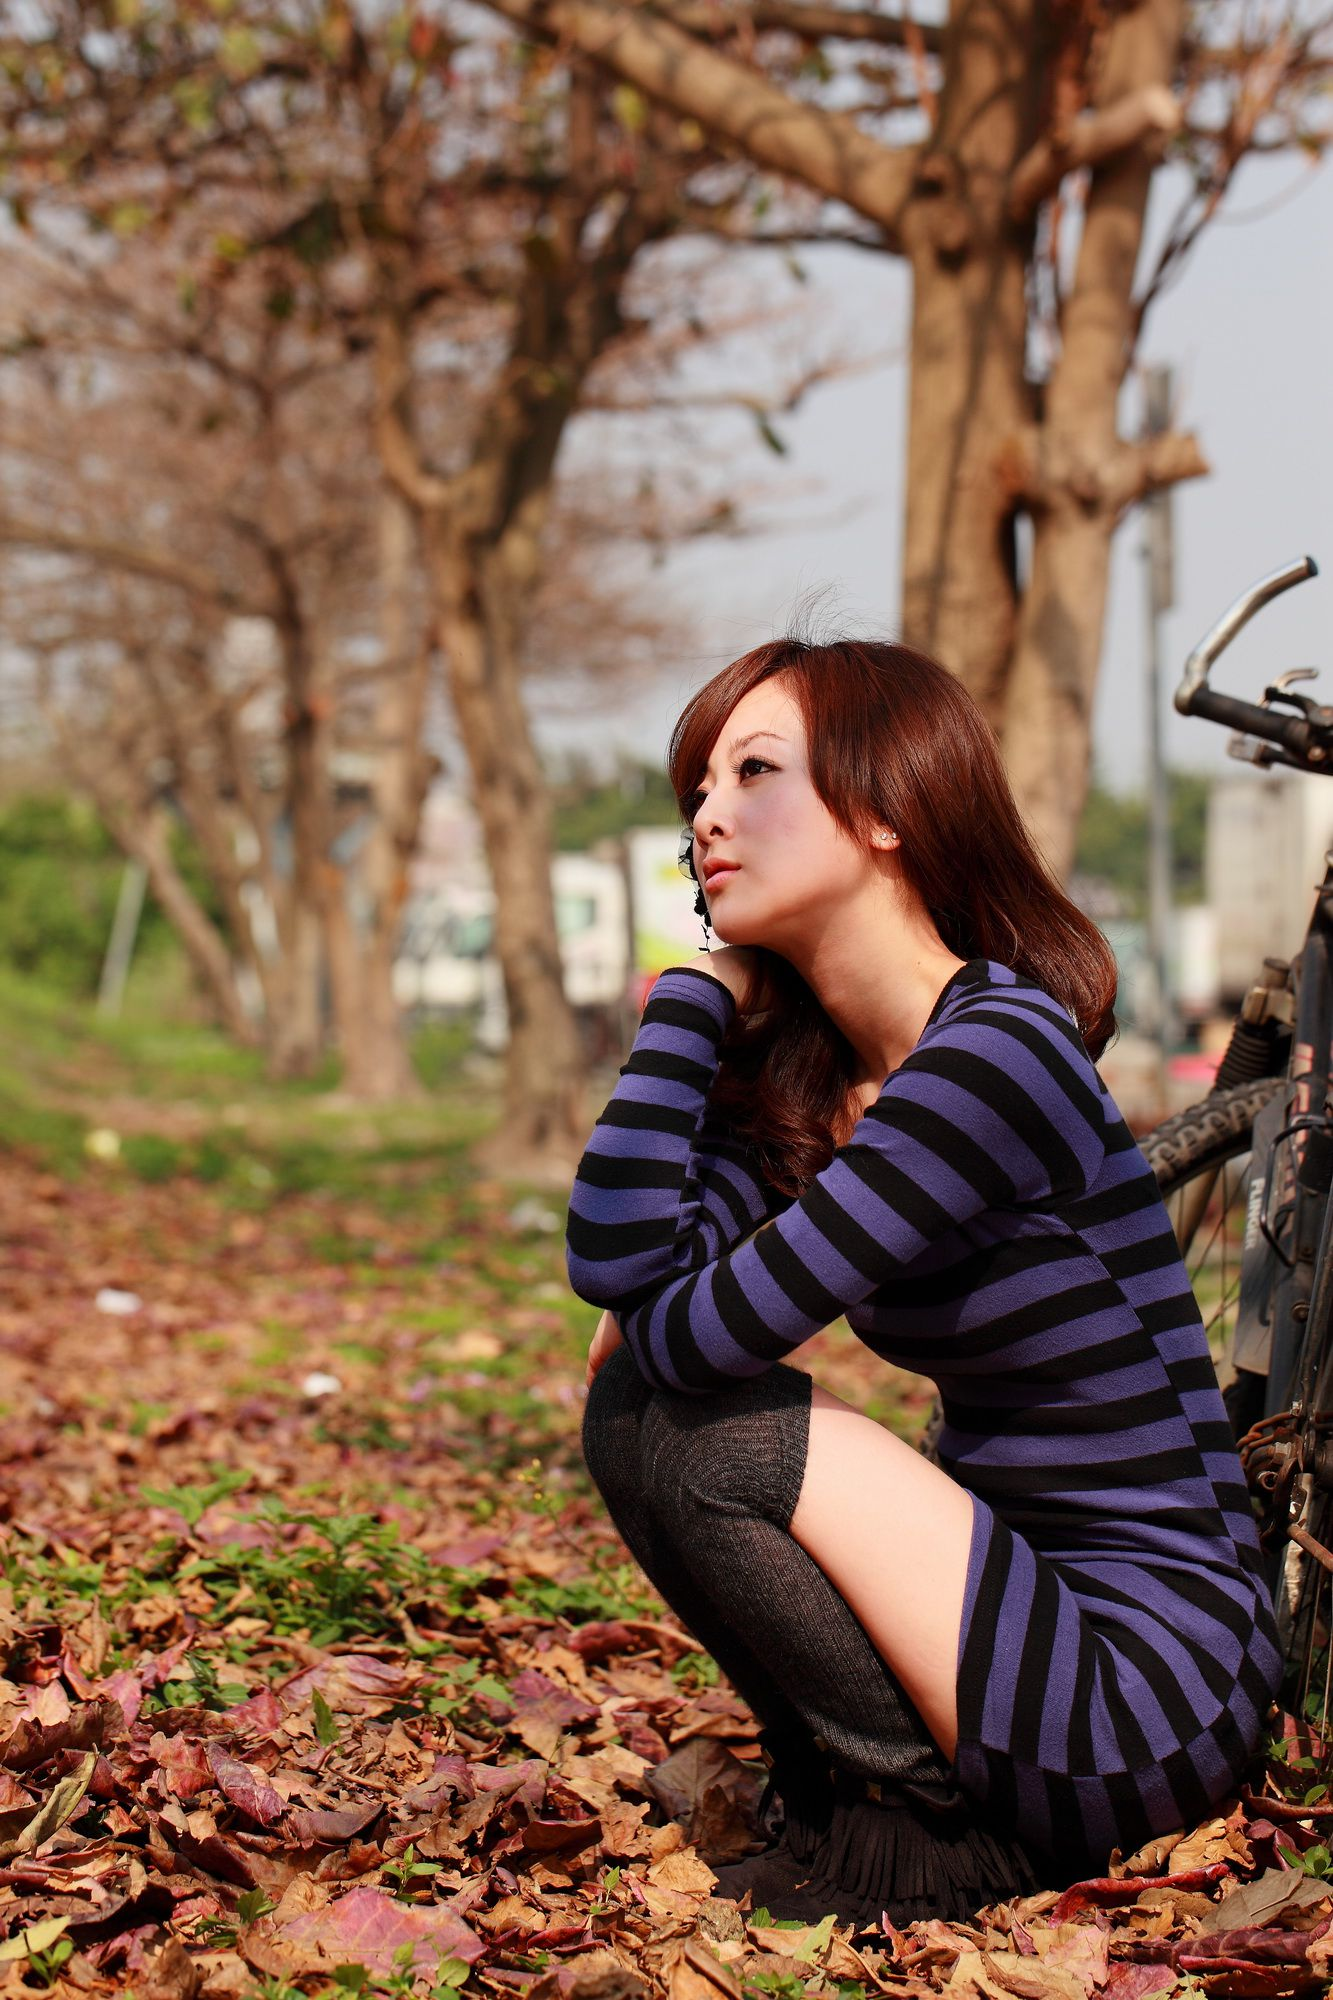 VOL.1601 [台湾正妹]清新外拍正妹:张凯洁(张允霏,果子MM)高品质写真套图(66P)